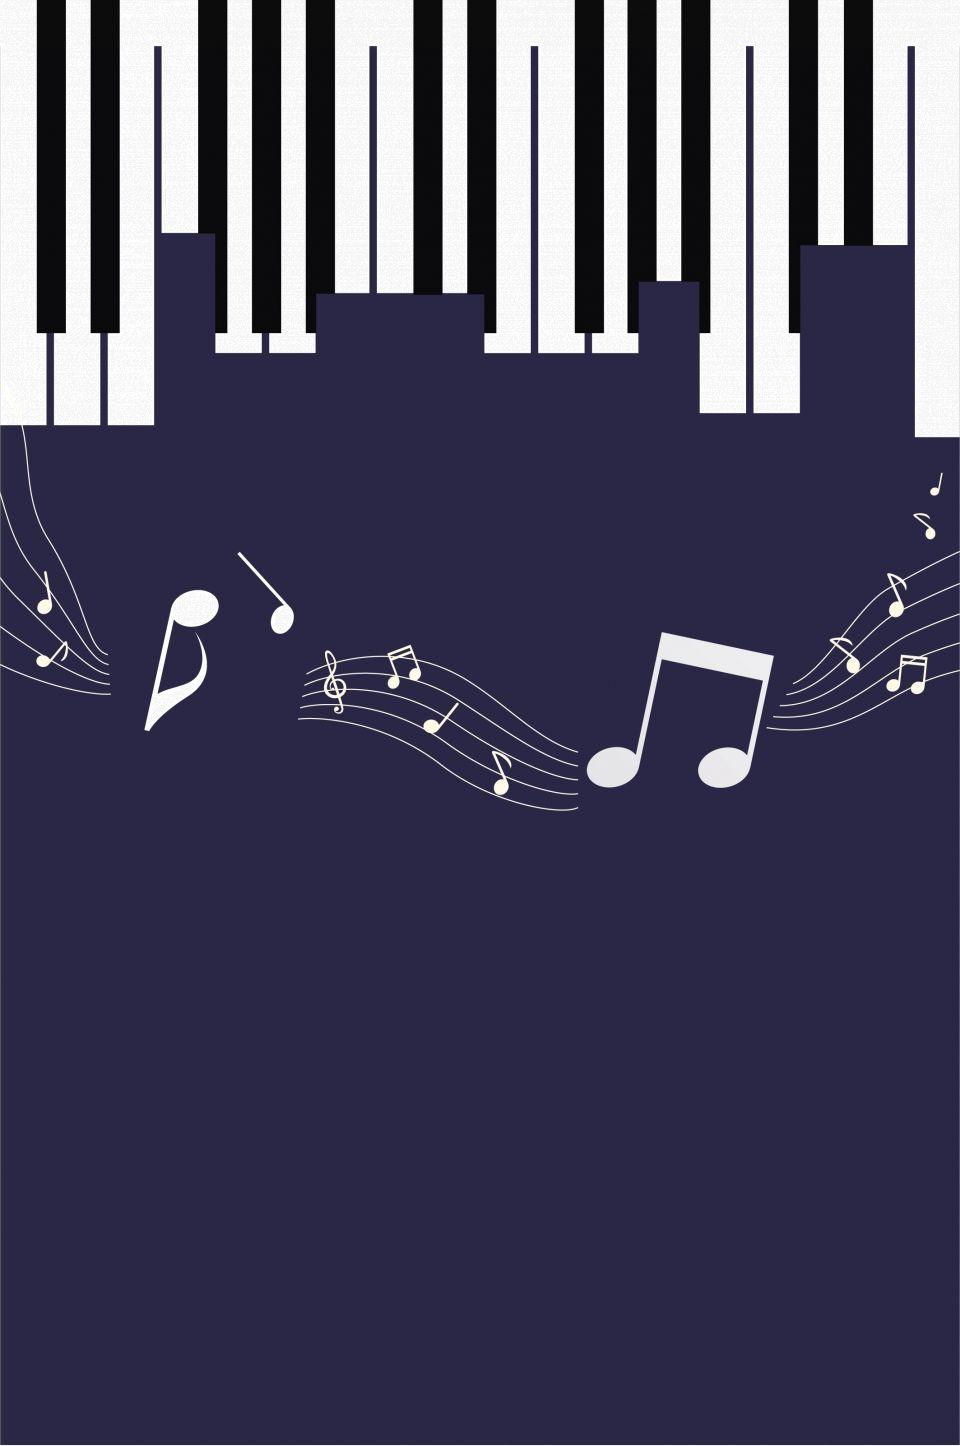 Fondo De Entrenamiento De Piano De Sueño Musical Music Festival Poster Piano Art Music Poster